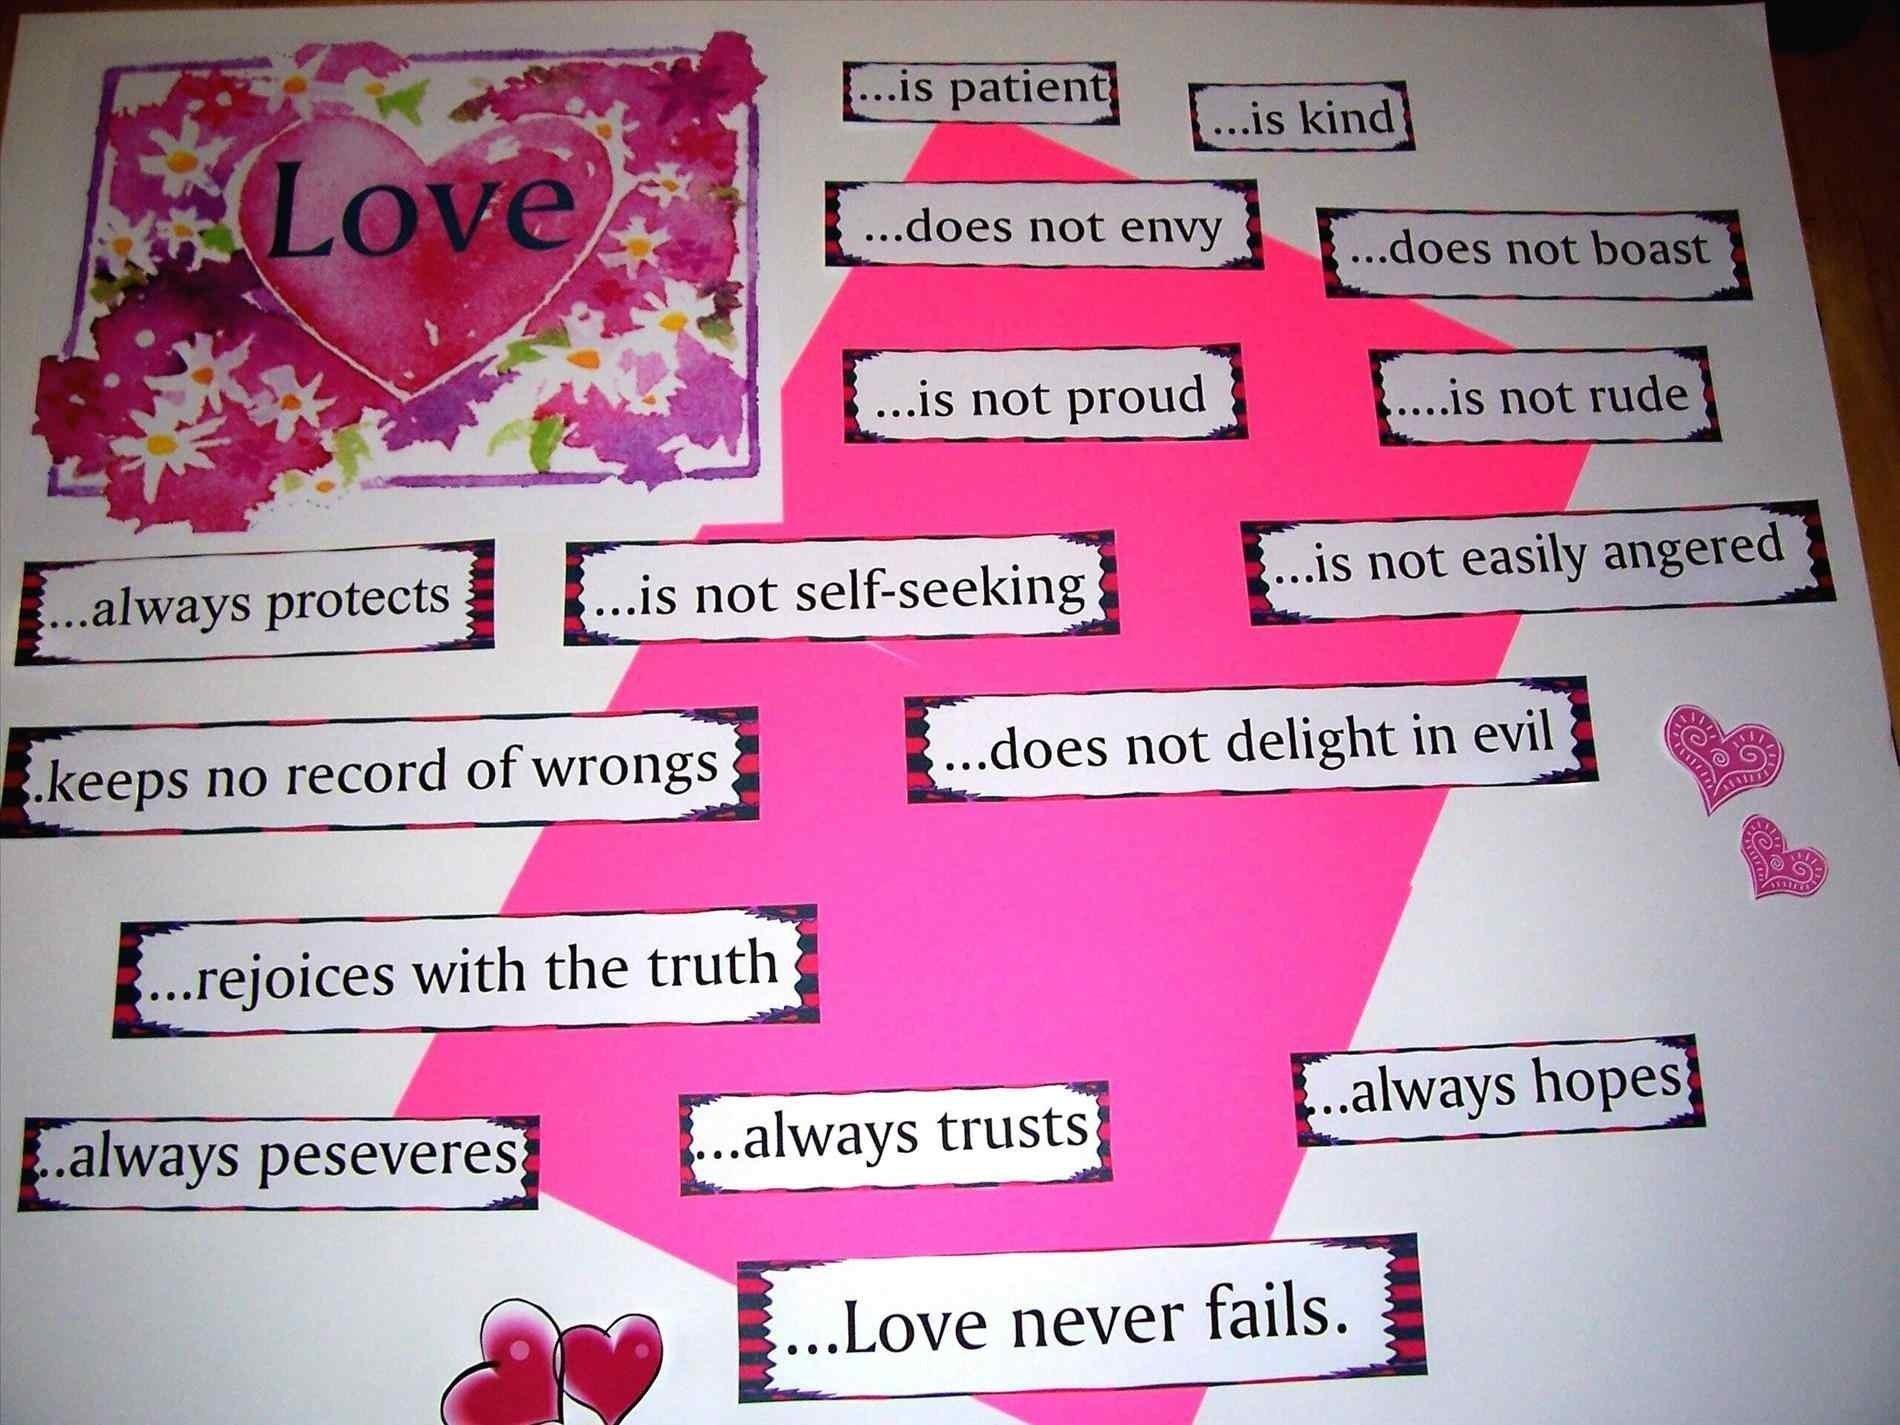 10 Ideal High School Valentines Day Ideas valentines day ideas for high school your meme source 2020